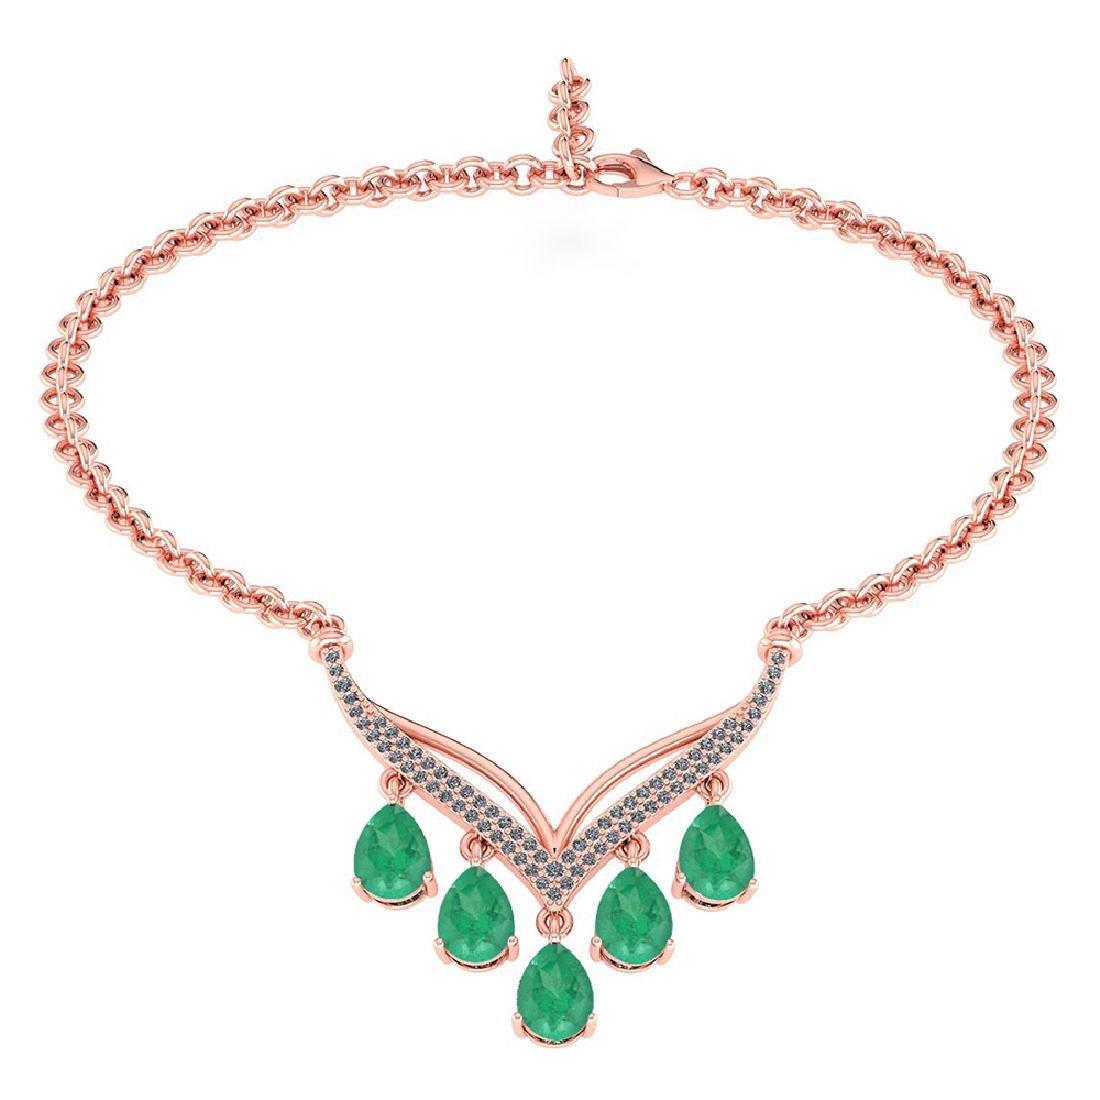 Certified 4.19 CTW Genuine Emerald And Diamond 14k Rose